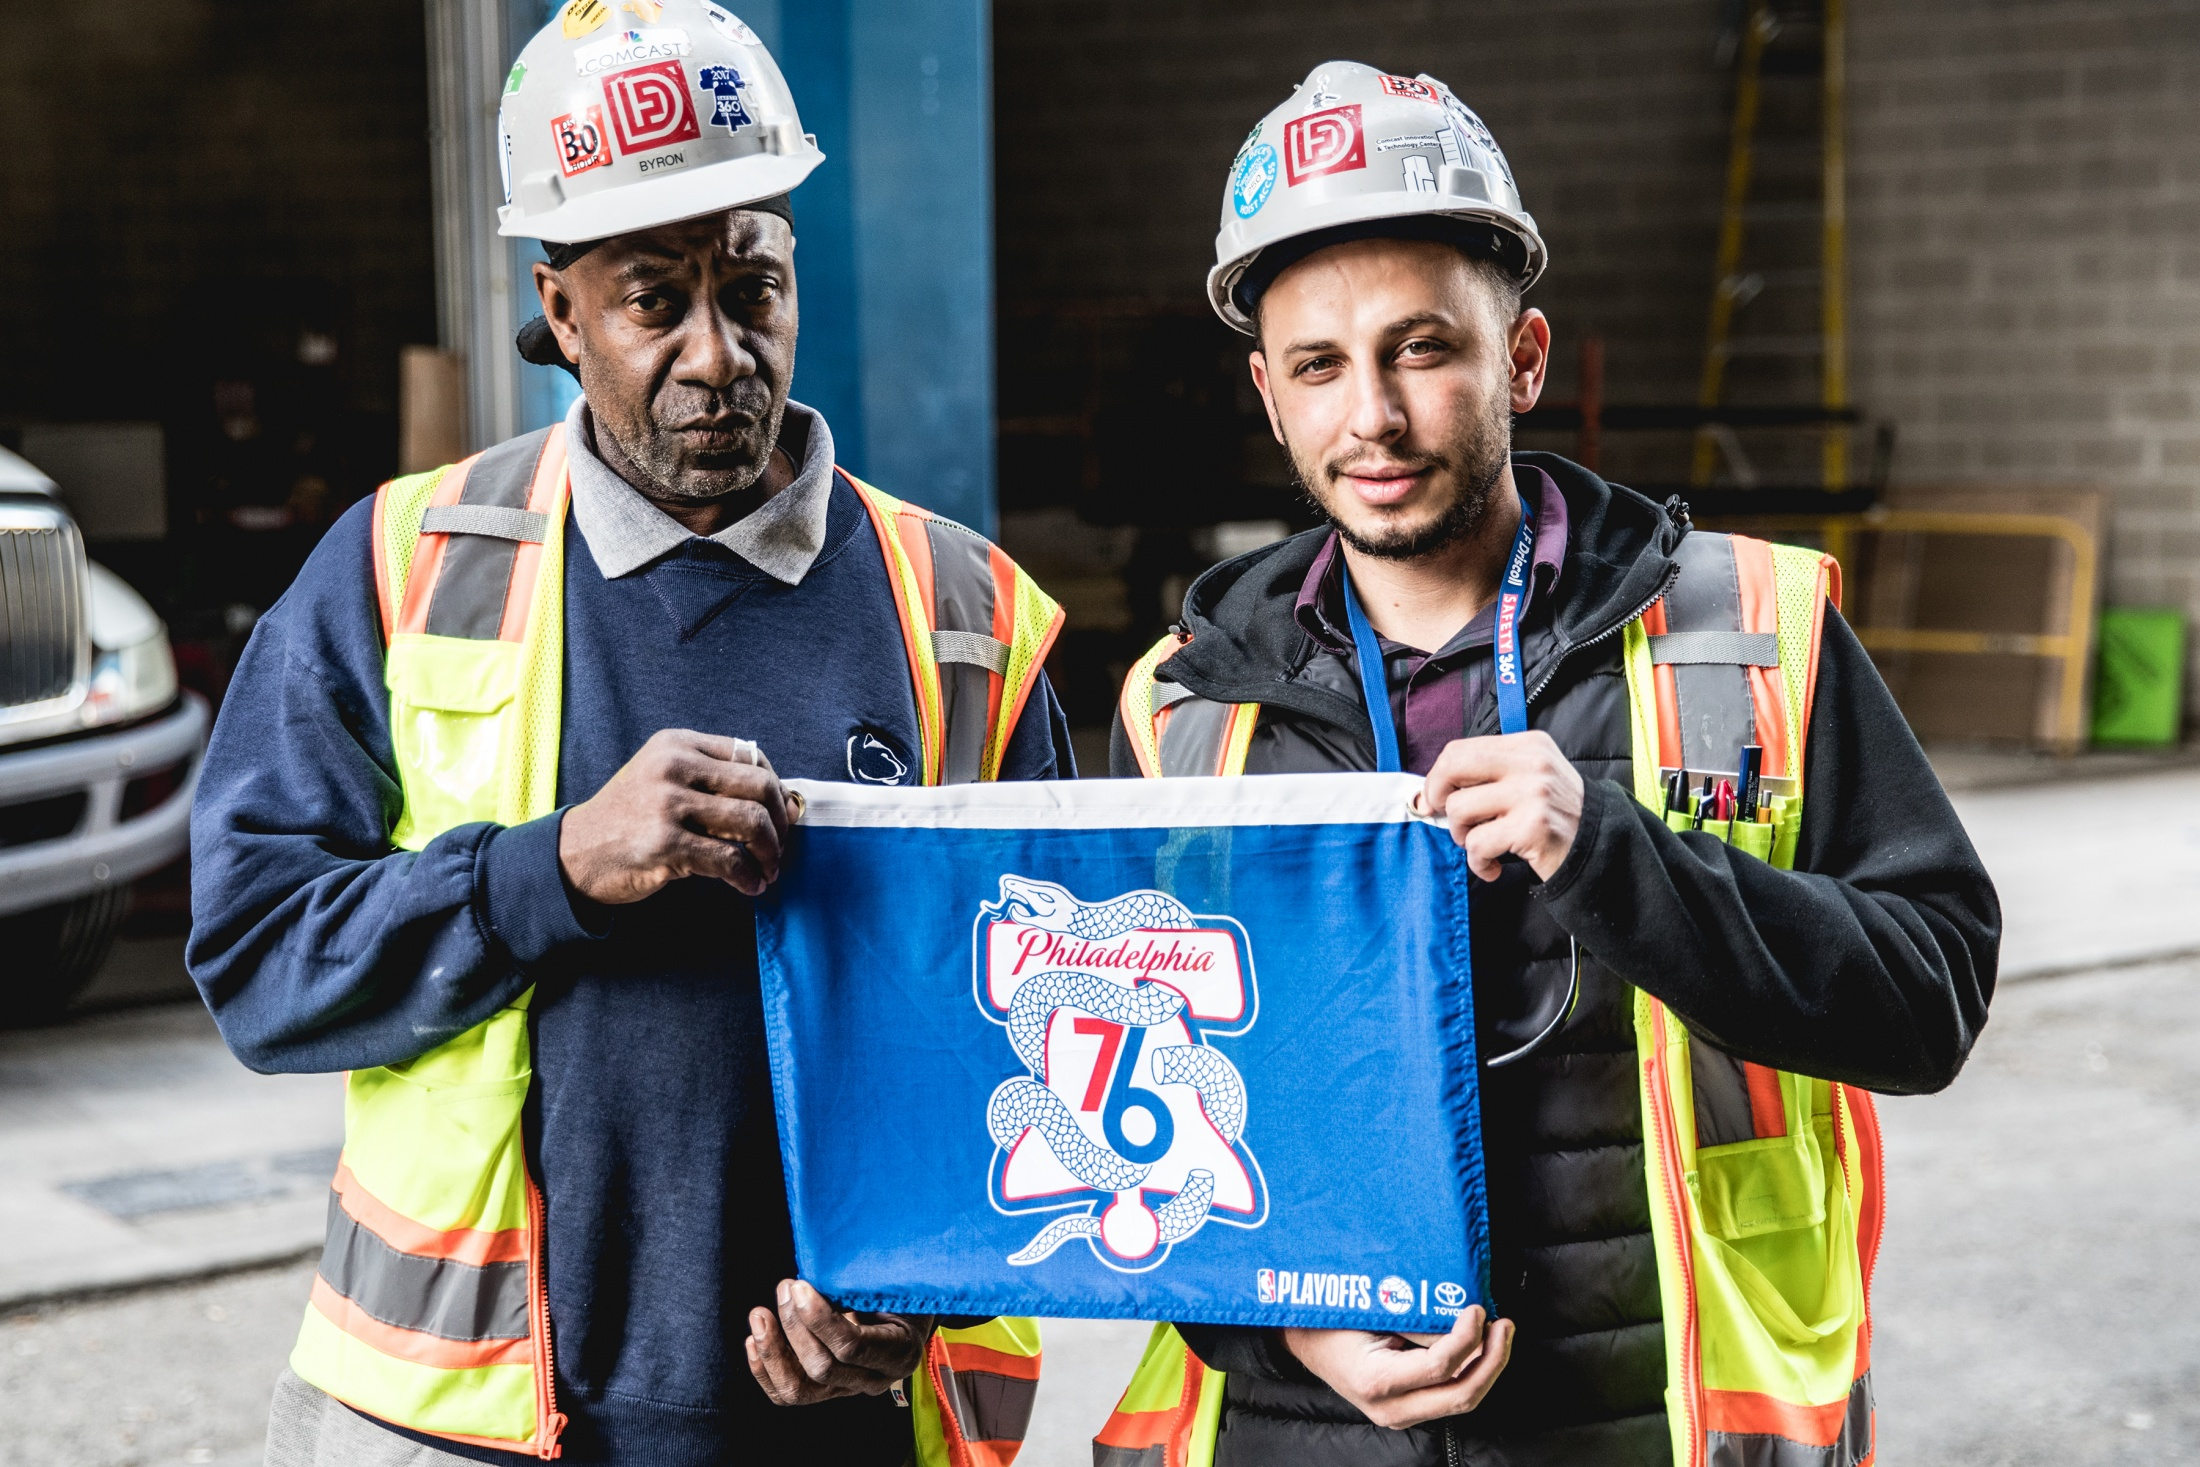 Thumbnail for Philadelphia 76ers - Phila Unite - 2018 Playoff Campaign